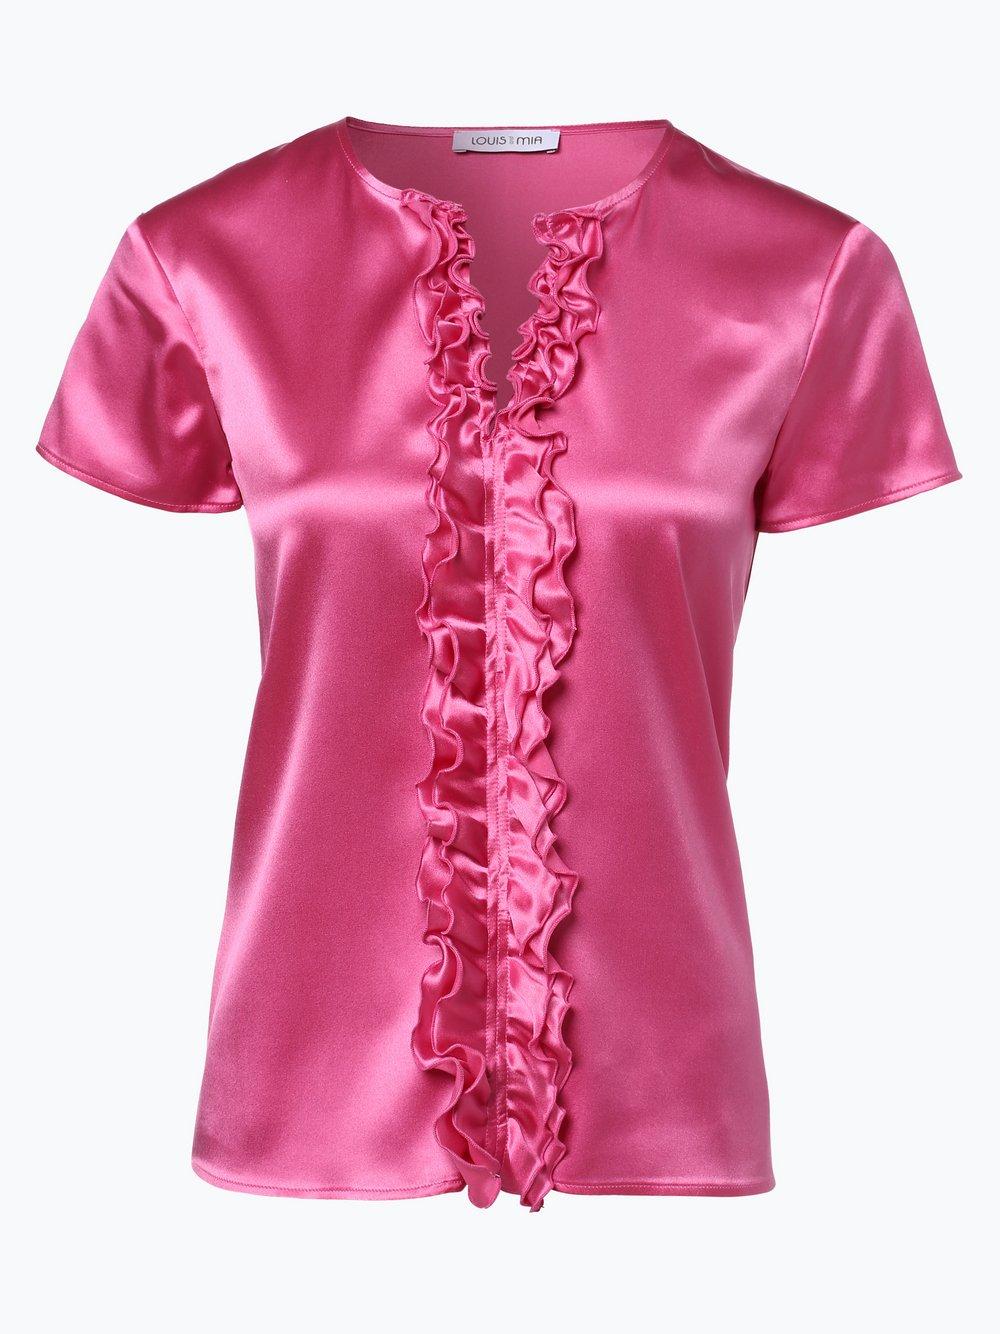 Damen Bluse mit Seiden-Anteil beige Louis and Mia PPEg9hdb